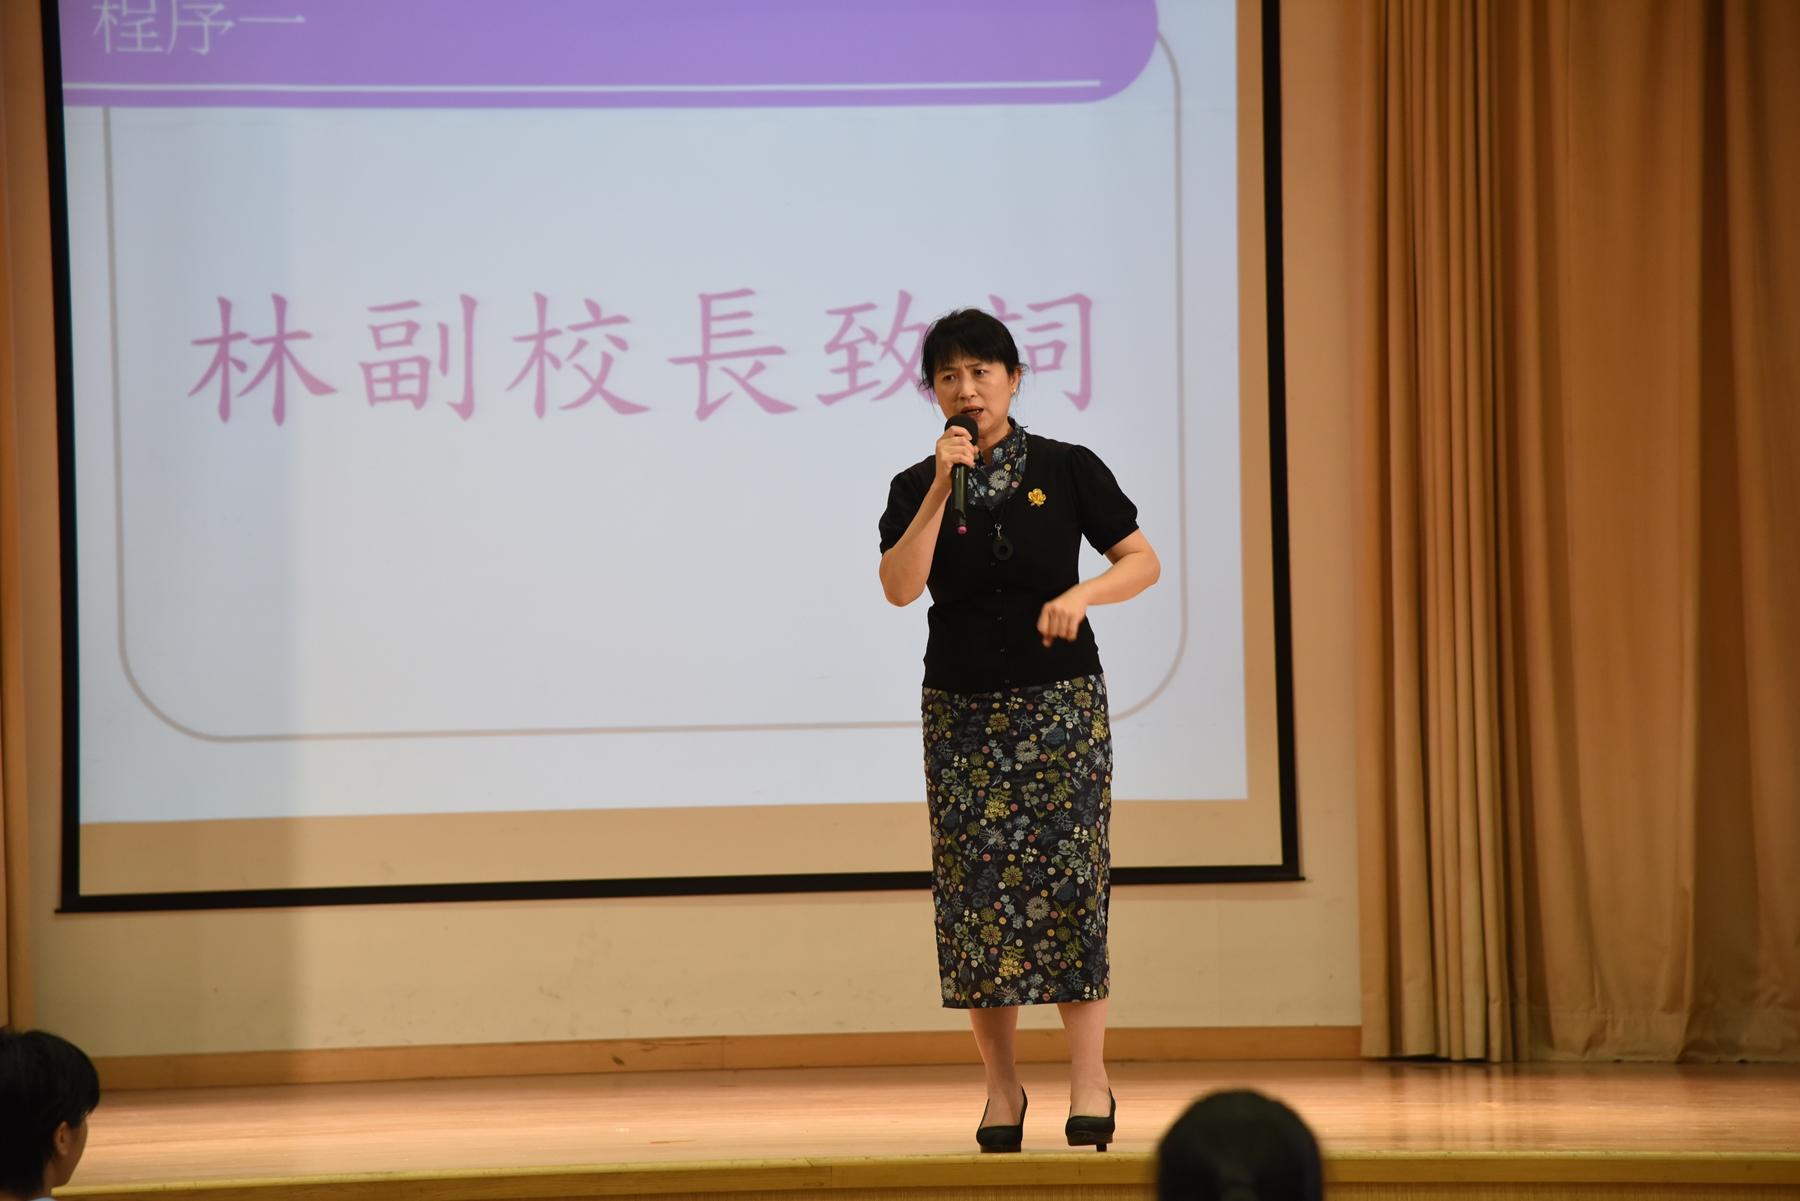 http://www.npc.edu.hk/sites/default/files/dsc_1128.jpg